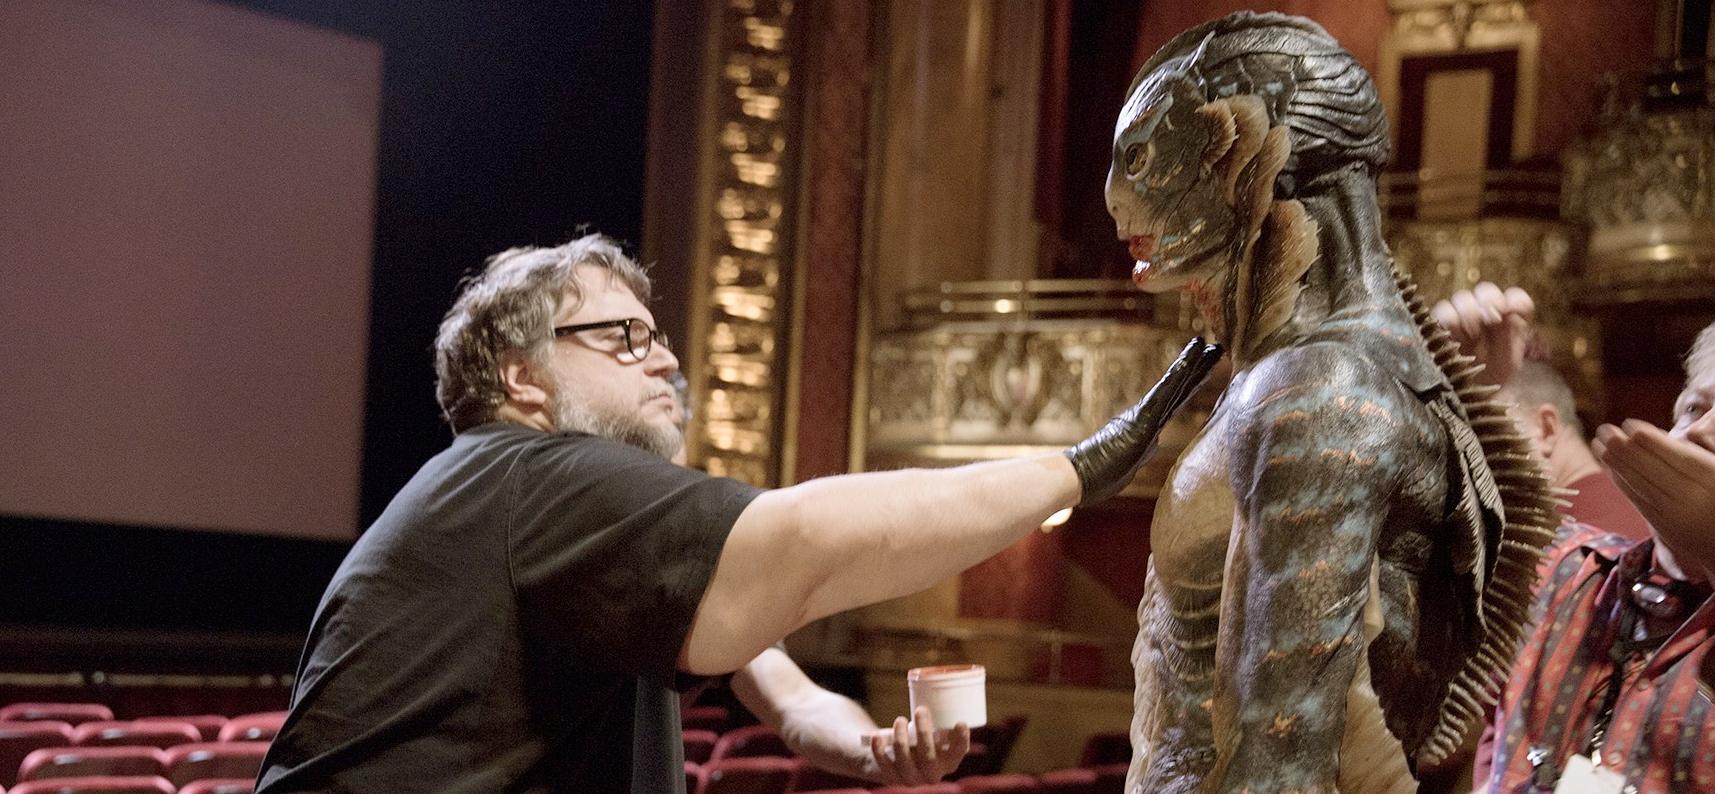 2018 DGA Awards Winners: Guillermo del Toro, Jordan Peele